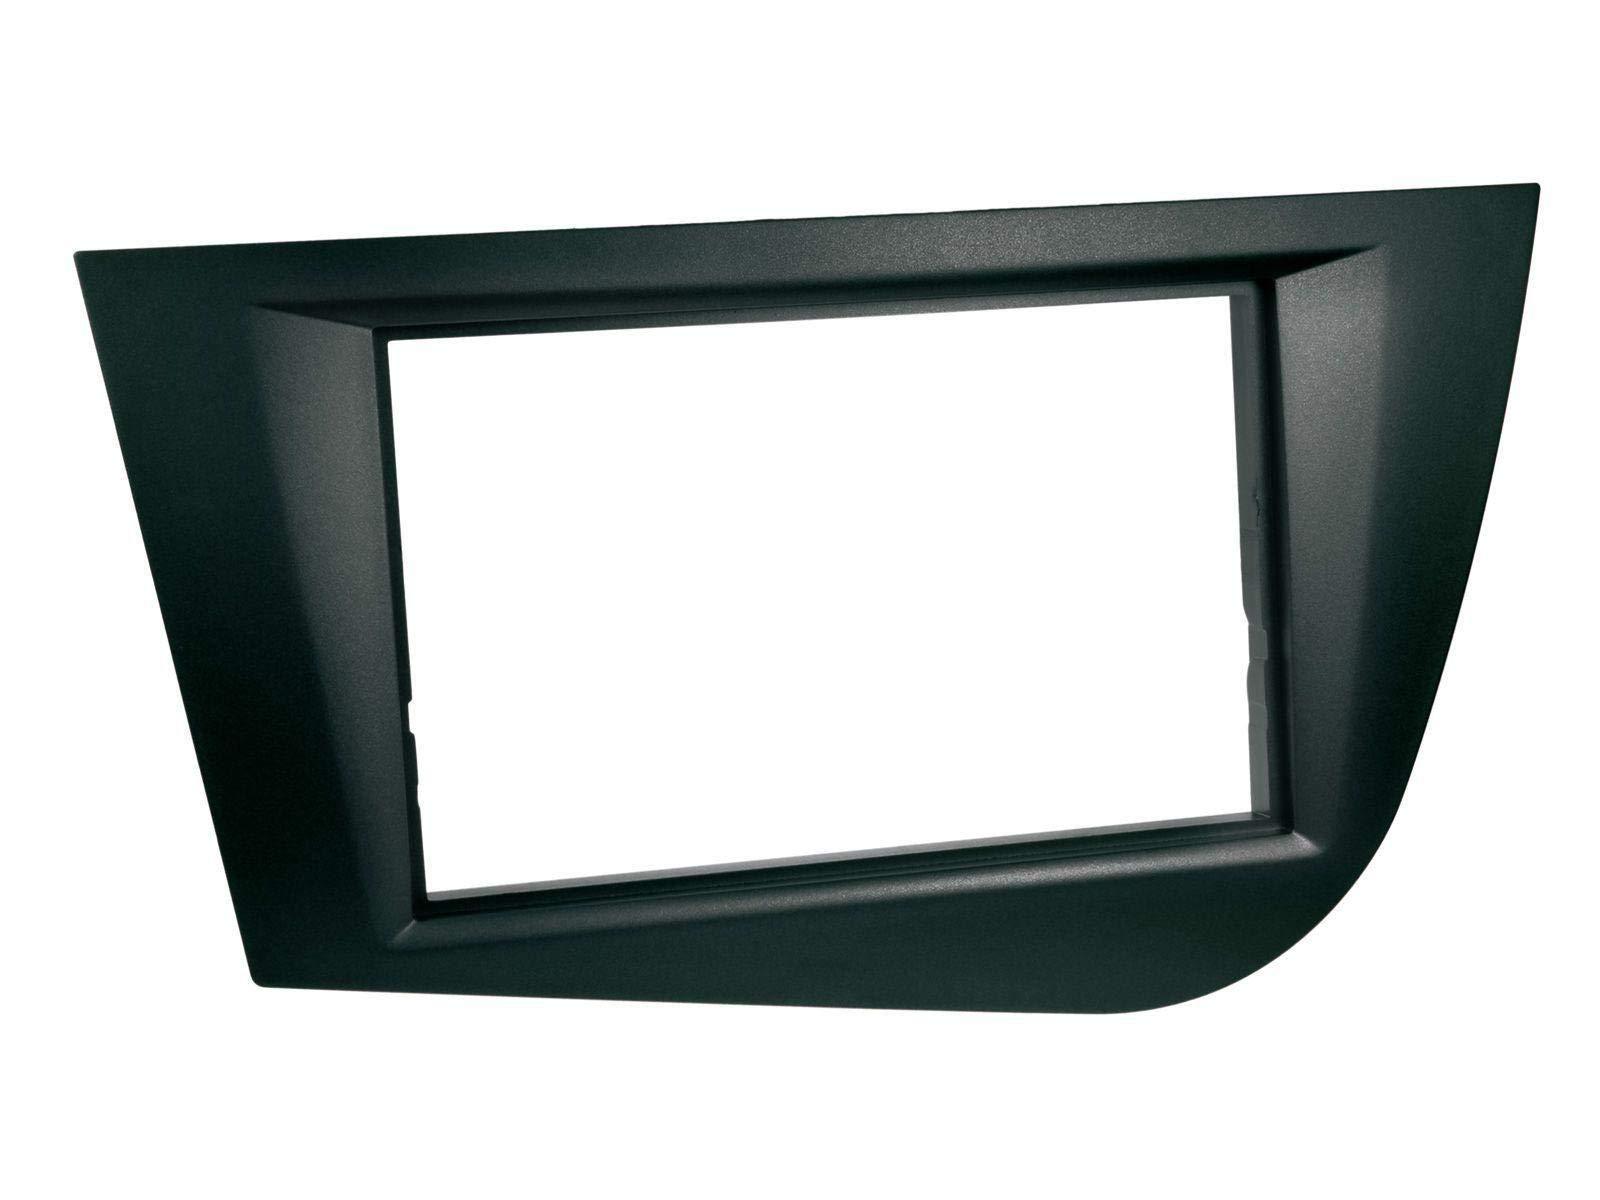 caraudio24-Kenwood-DMX120BT-AUX-Bluetooth-USB-MP3-2DIN-Autoradio-fr-Seat-Leon-05-09-schwarz